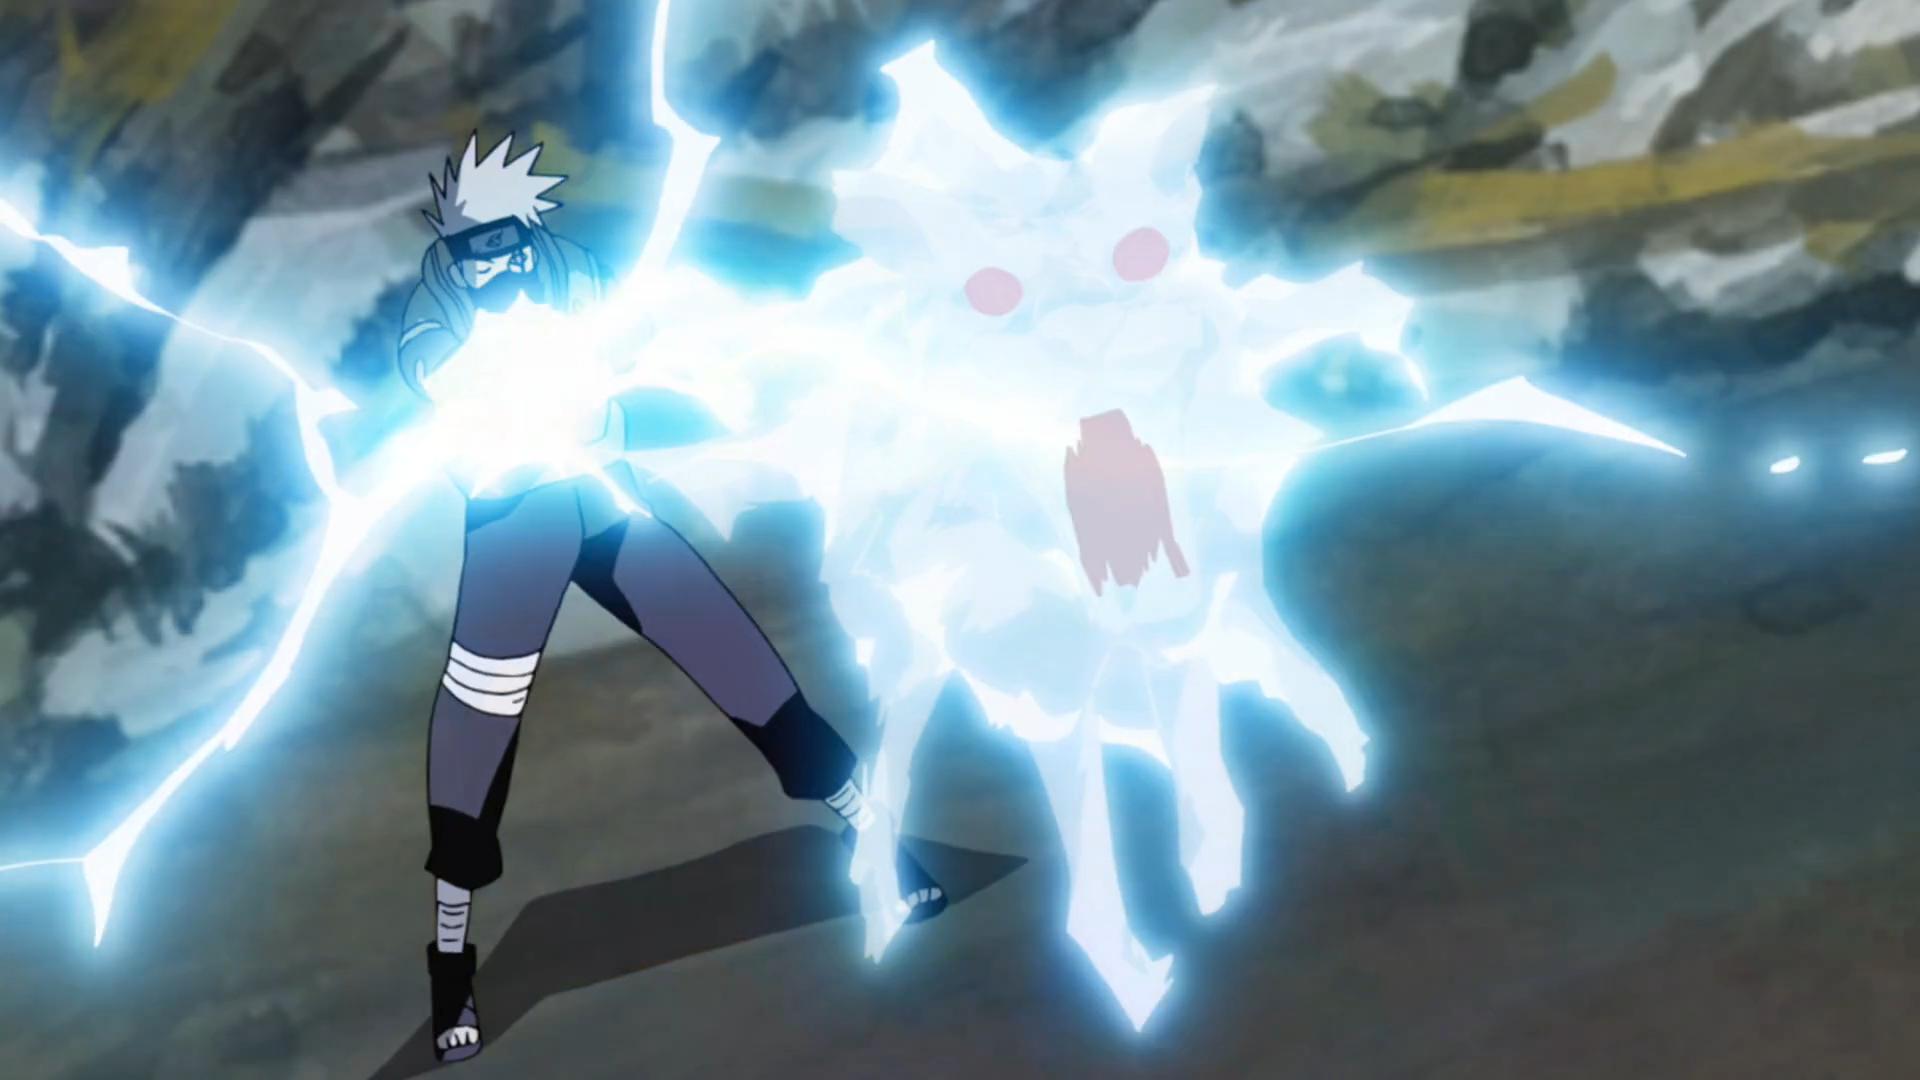 Lightning Release Lightning Beast Tracking Fang Narutopedia Fandom Thunder beast) is an electric yōkai. lightning release lightning beast